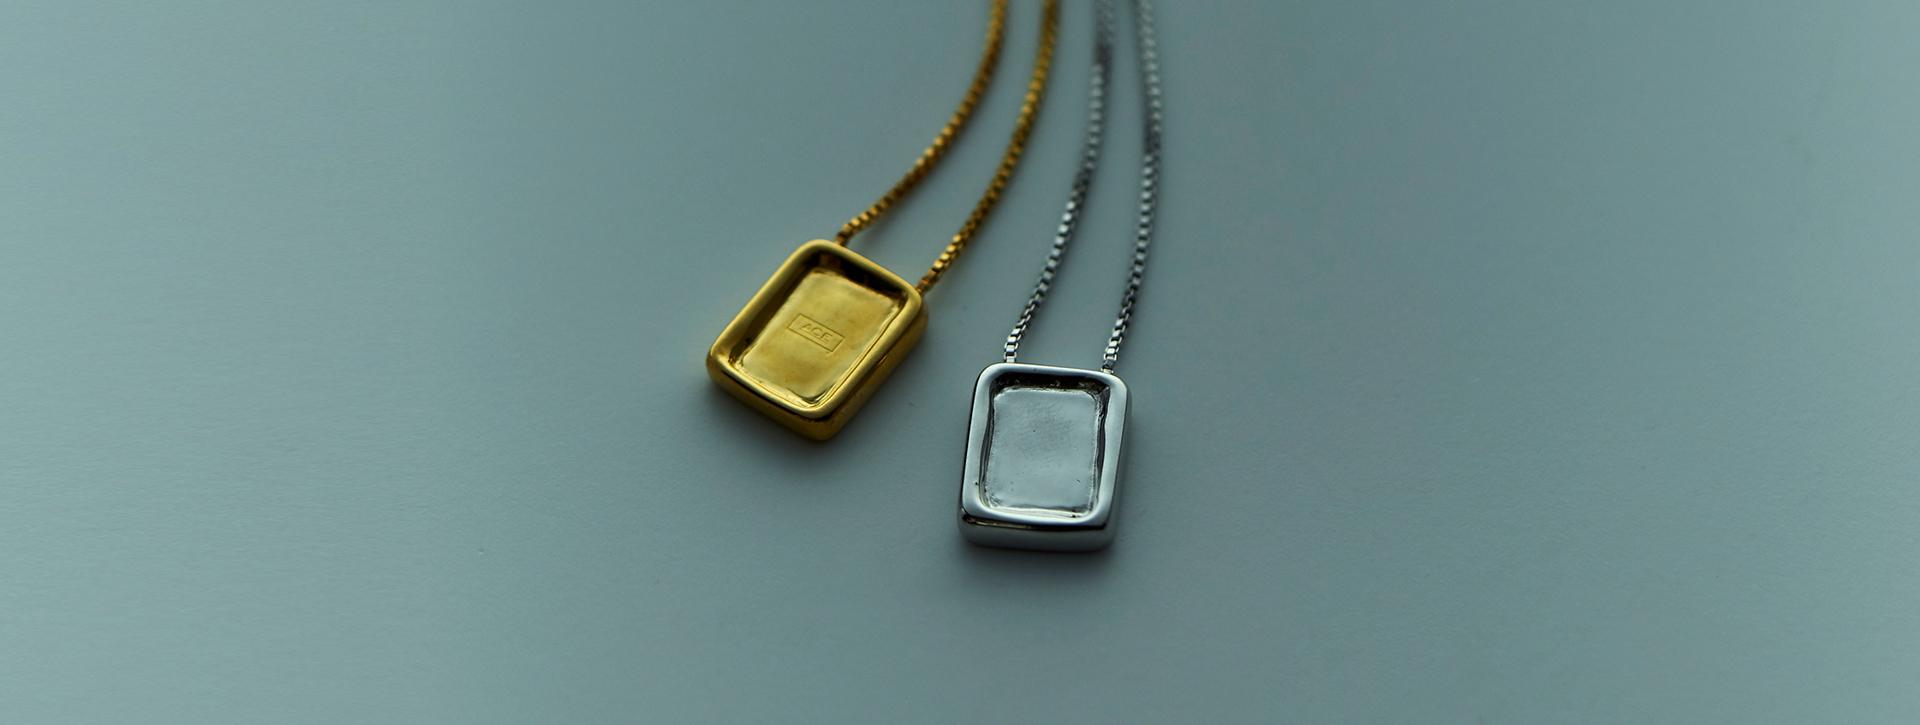 acecapulario necklace S gradation